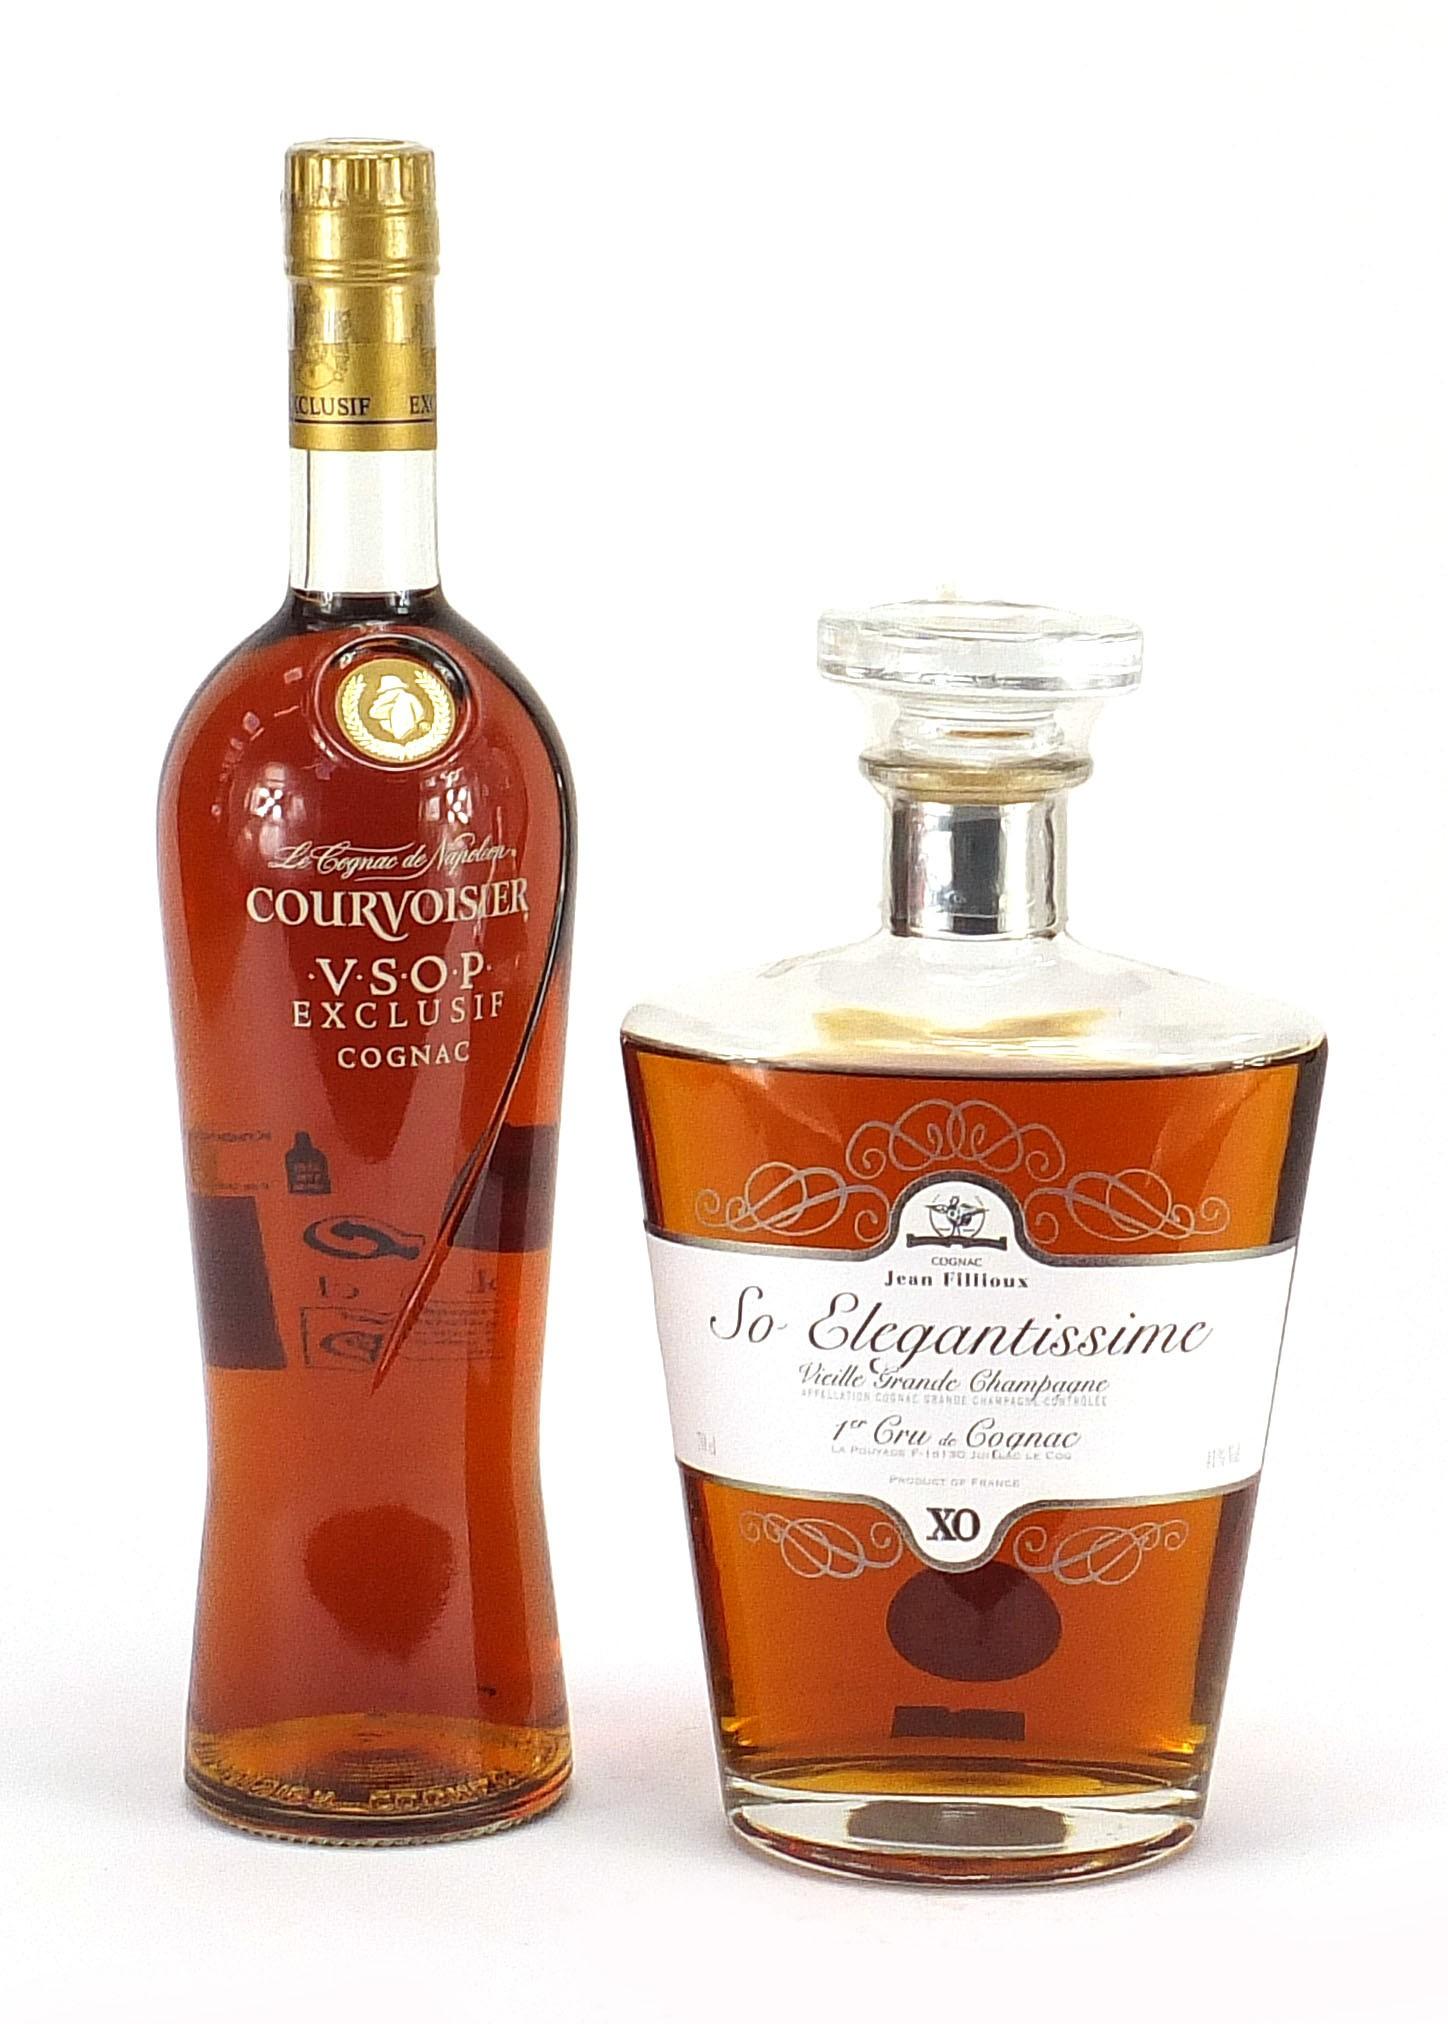 Two bottles of cognac comprising Courvoisier VSOP Exclusive and Jean Fillioux So Elegantissima 1er - Image 2 of 3